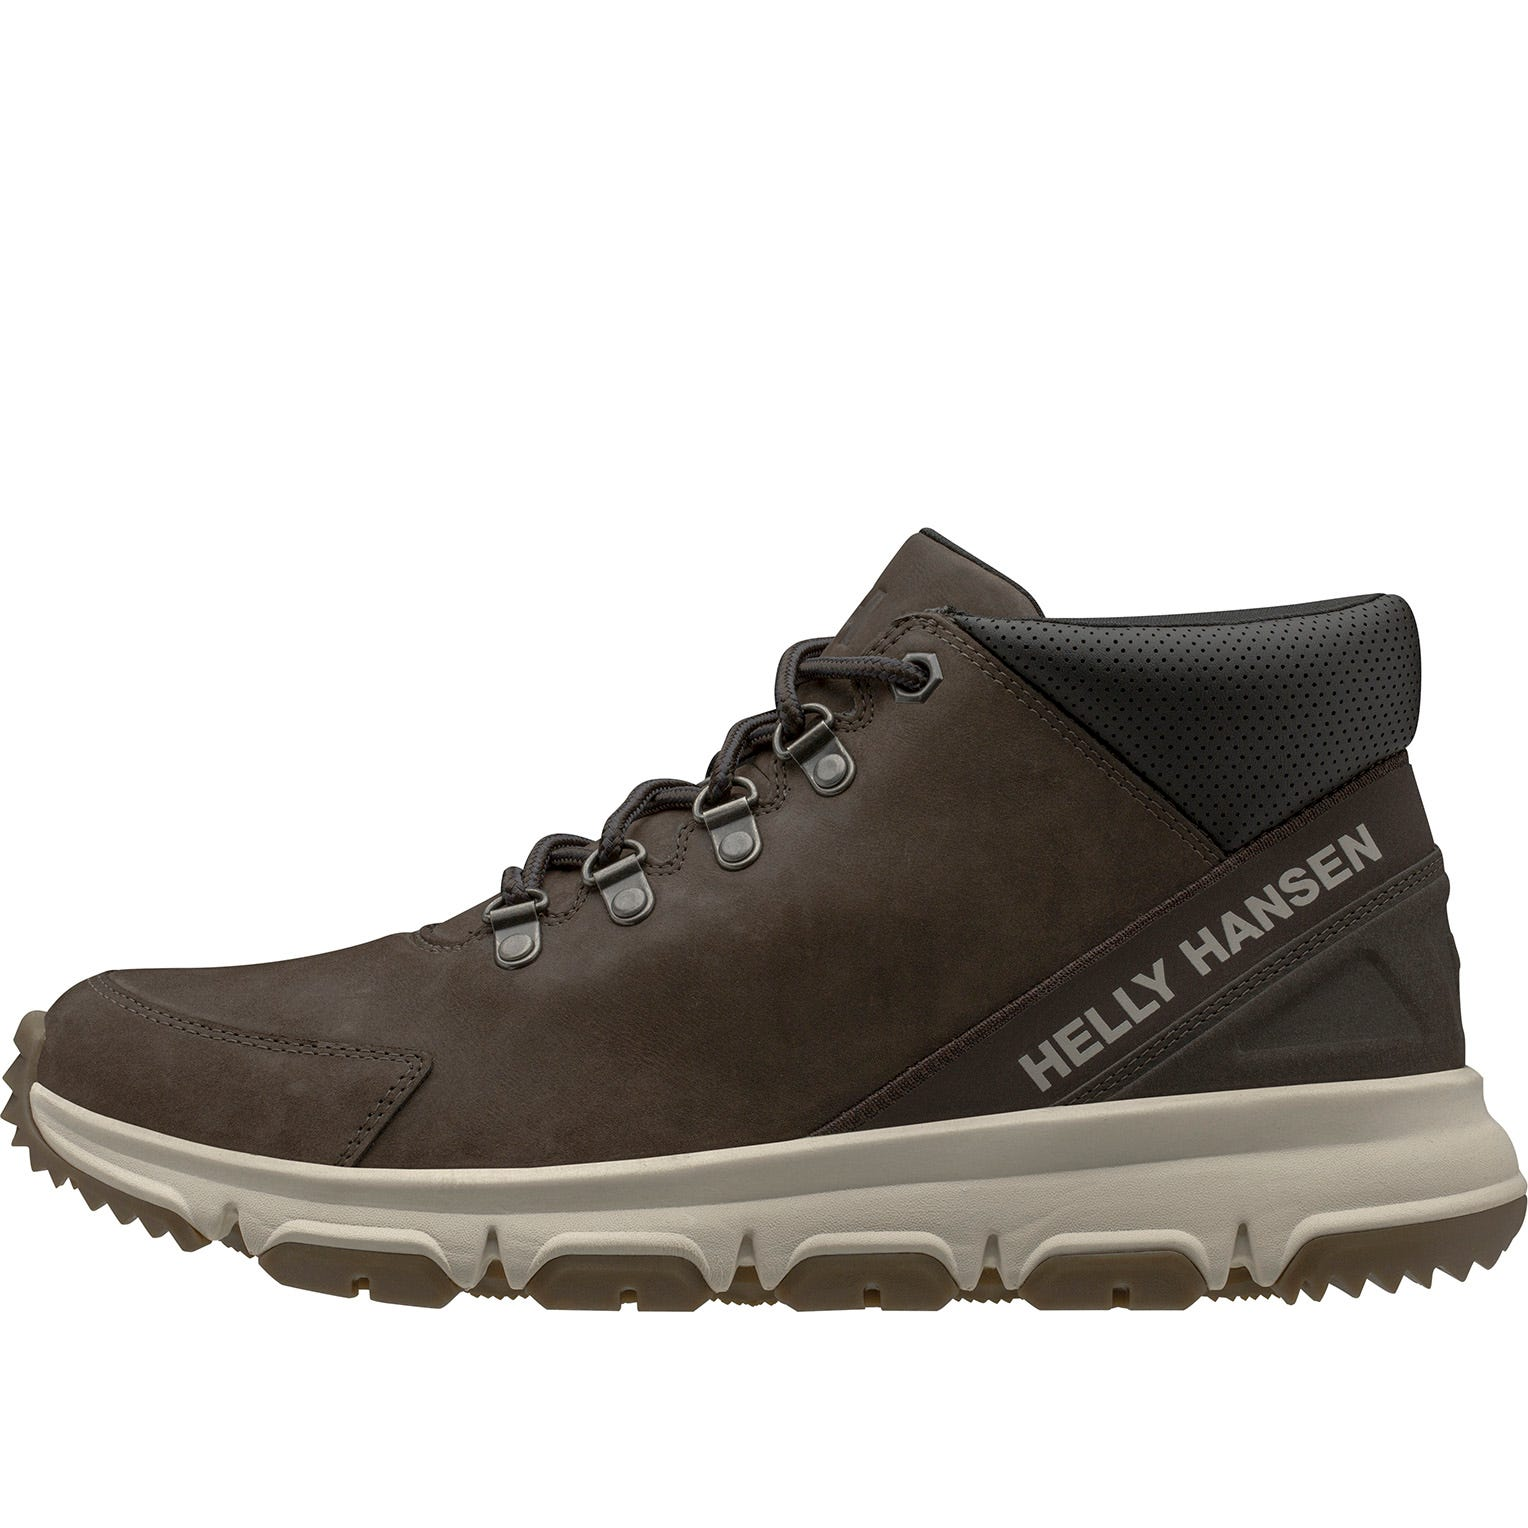 Helly Hansen Mens Fendvard Waterproof Leather Boots 9